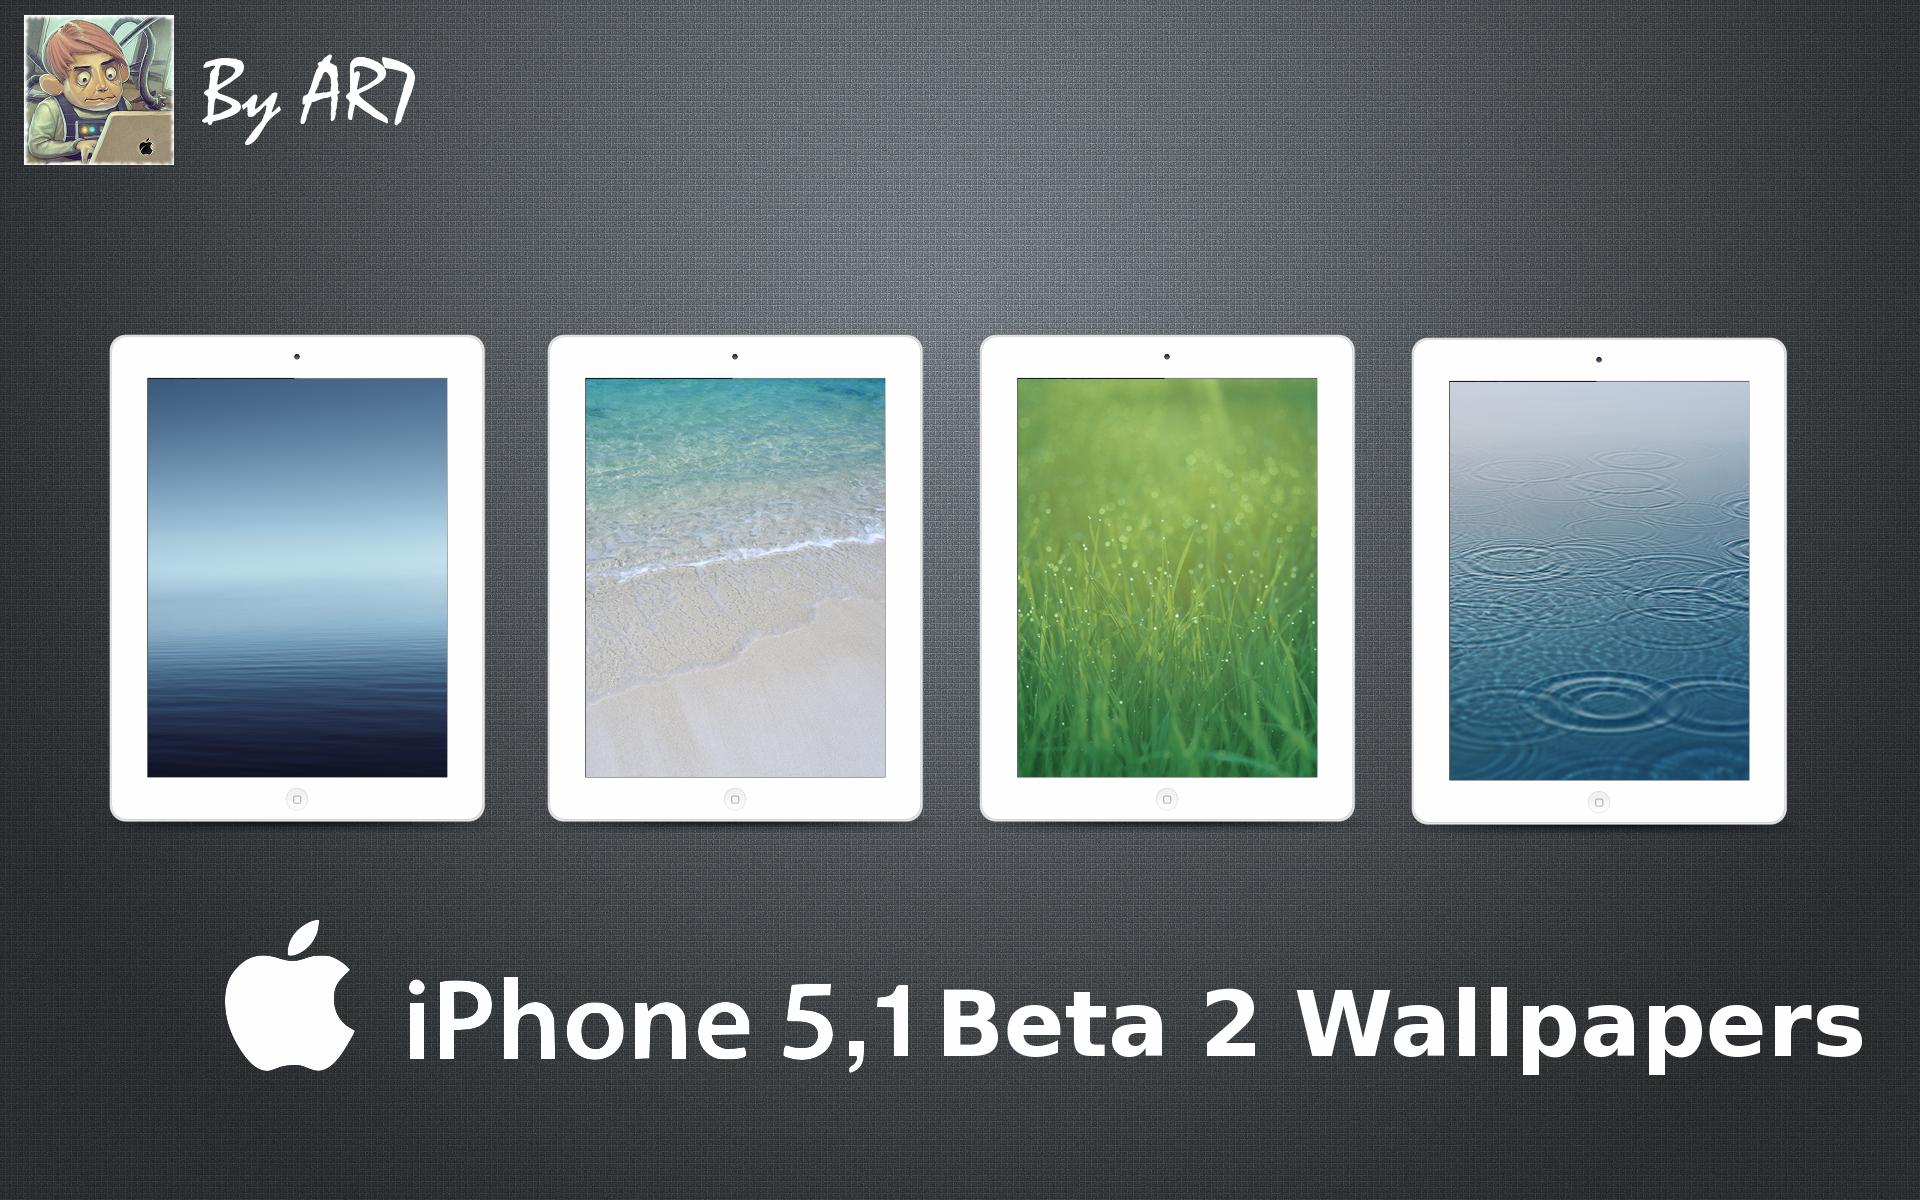 IOS 5 Wallpaper Pack